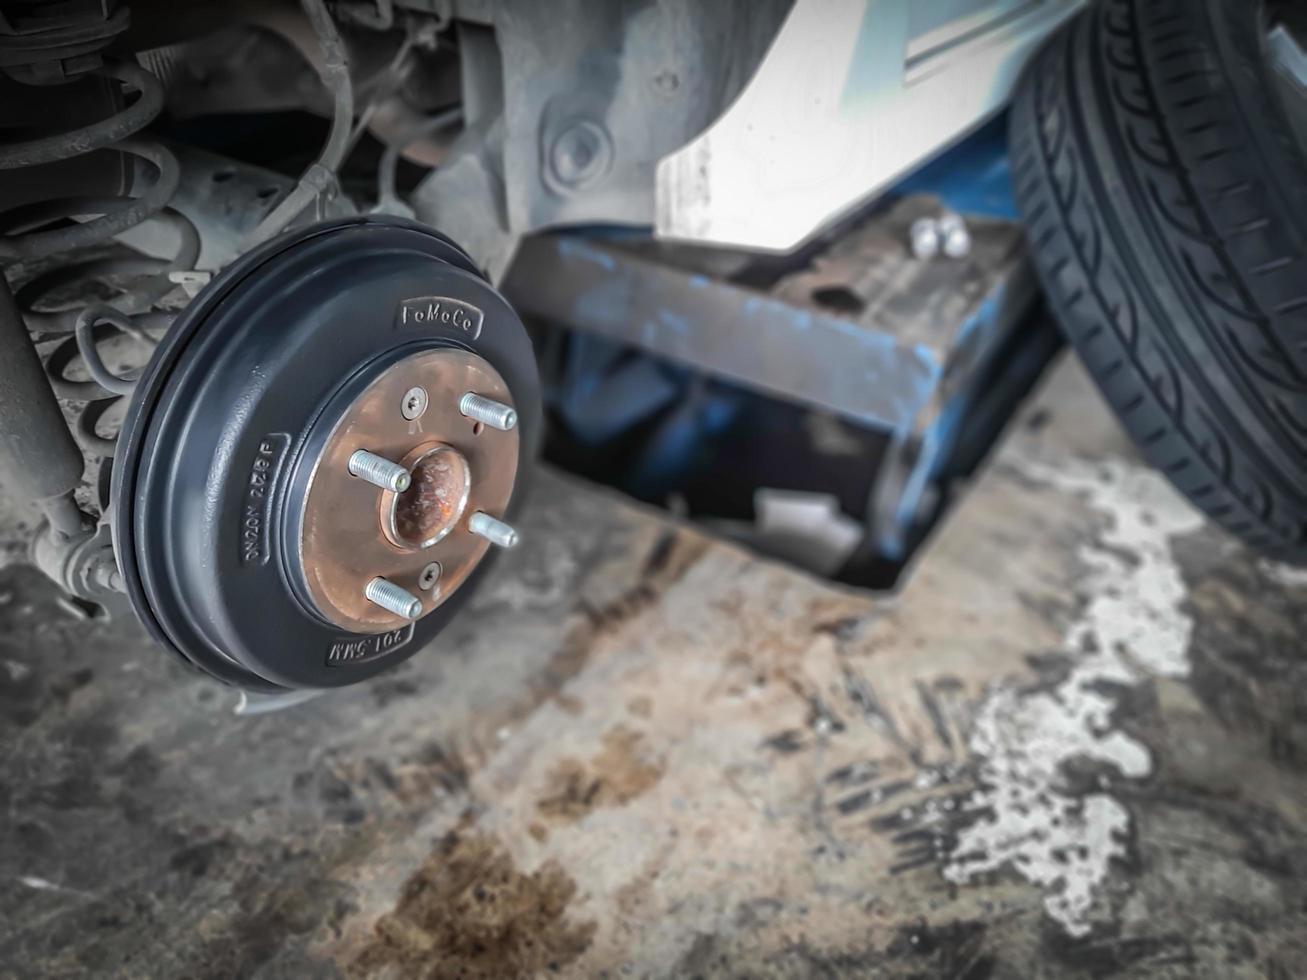 bil ta av hjulet visa trumbromsenhet. byte av däck. foto